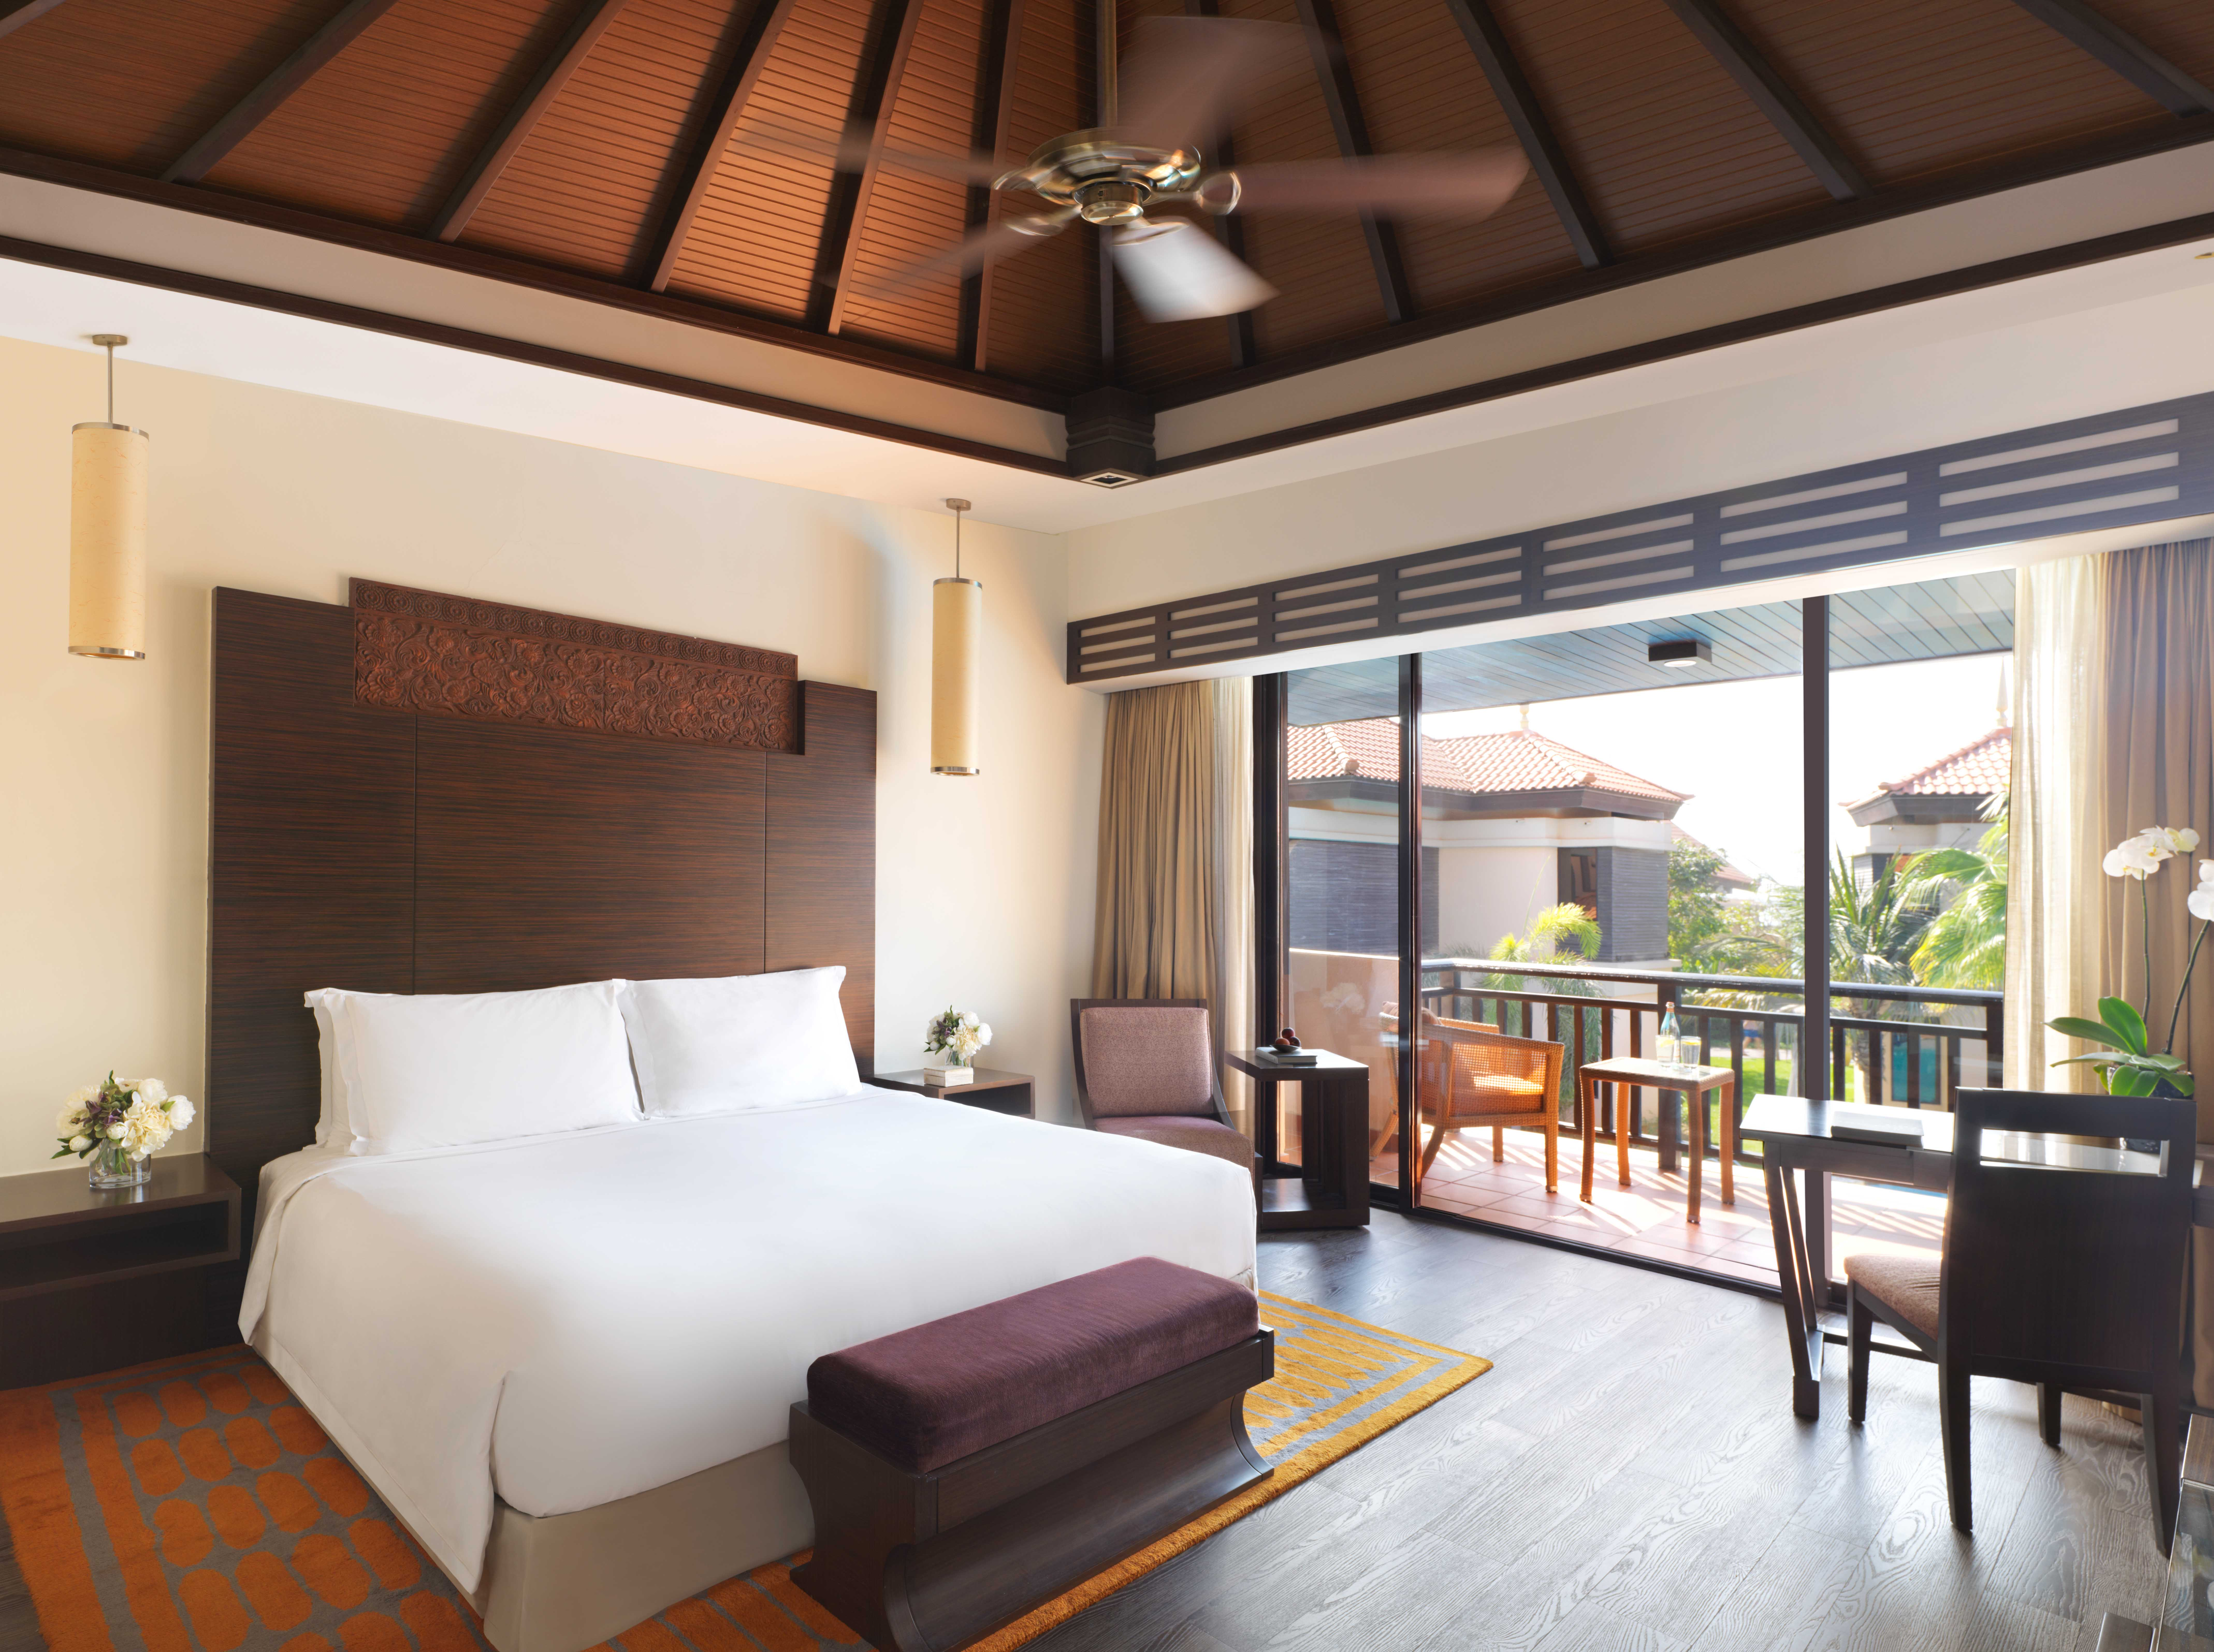 anantara-the-palm-dubai-luxury-room